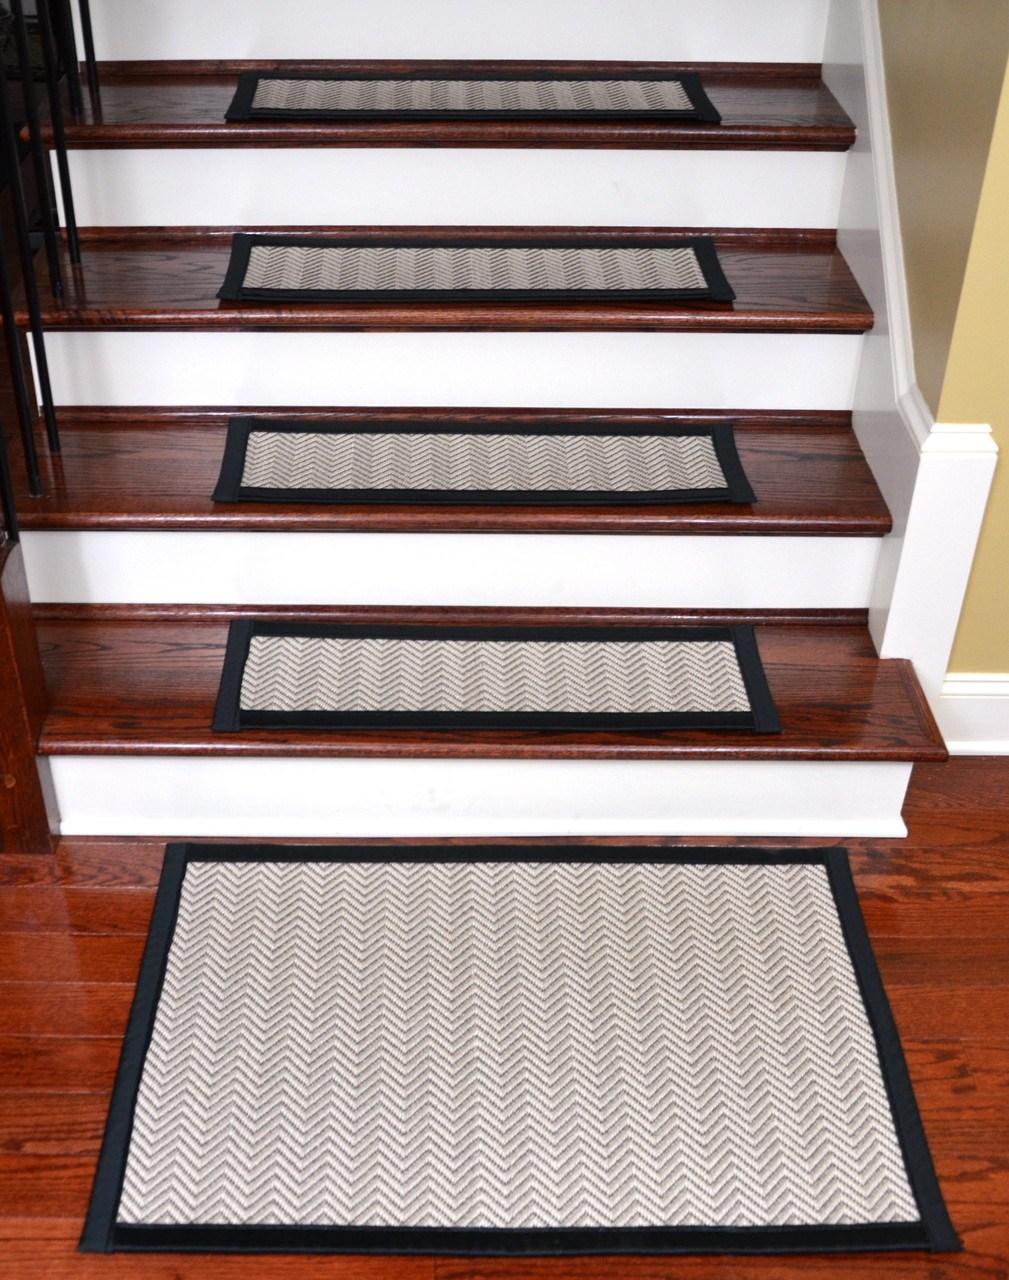 Hatteras Flatweave Stair Treads Tape Free 15 Pk   Non Slip Strips For Carpeted Stairs   Grip   Stair Nosing   Gravel   Slip Resistant   Brown Cinnamon